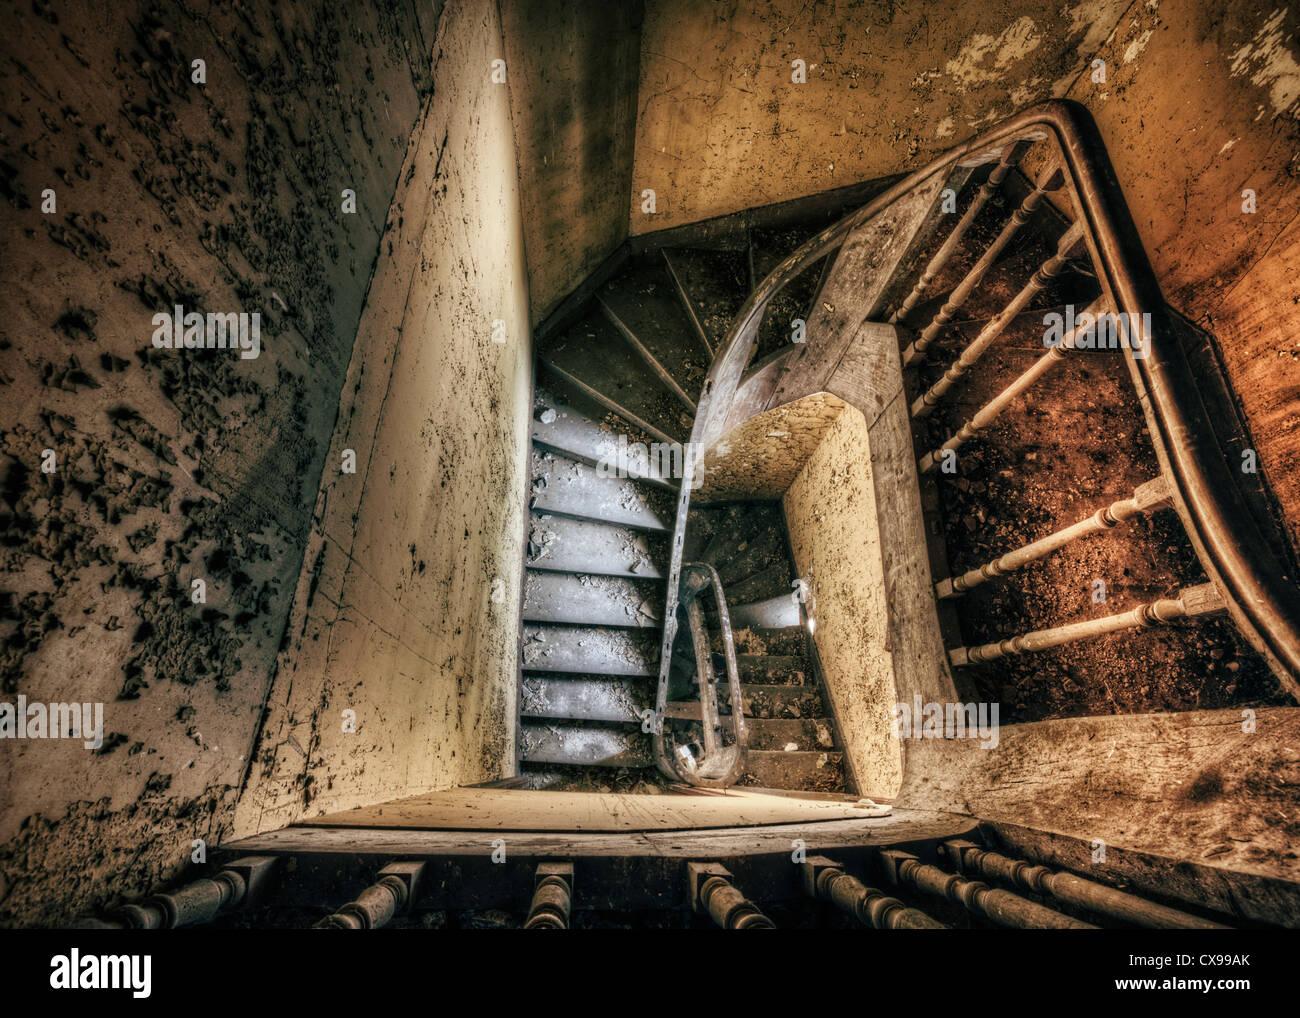 Escalera de Spooky casa abandonada Imagen De Stock